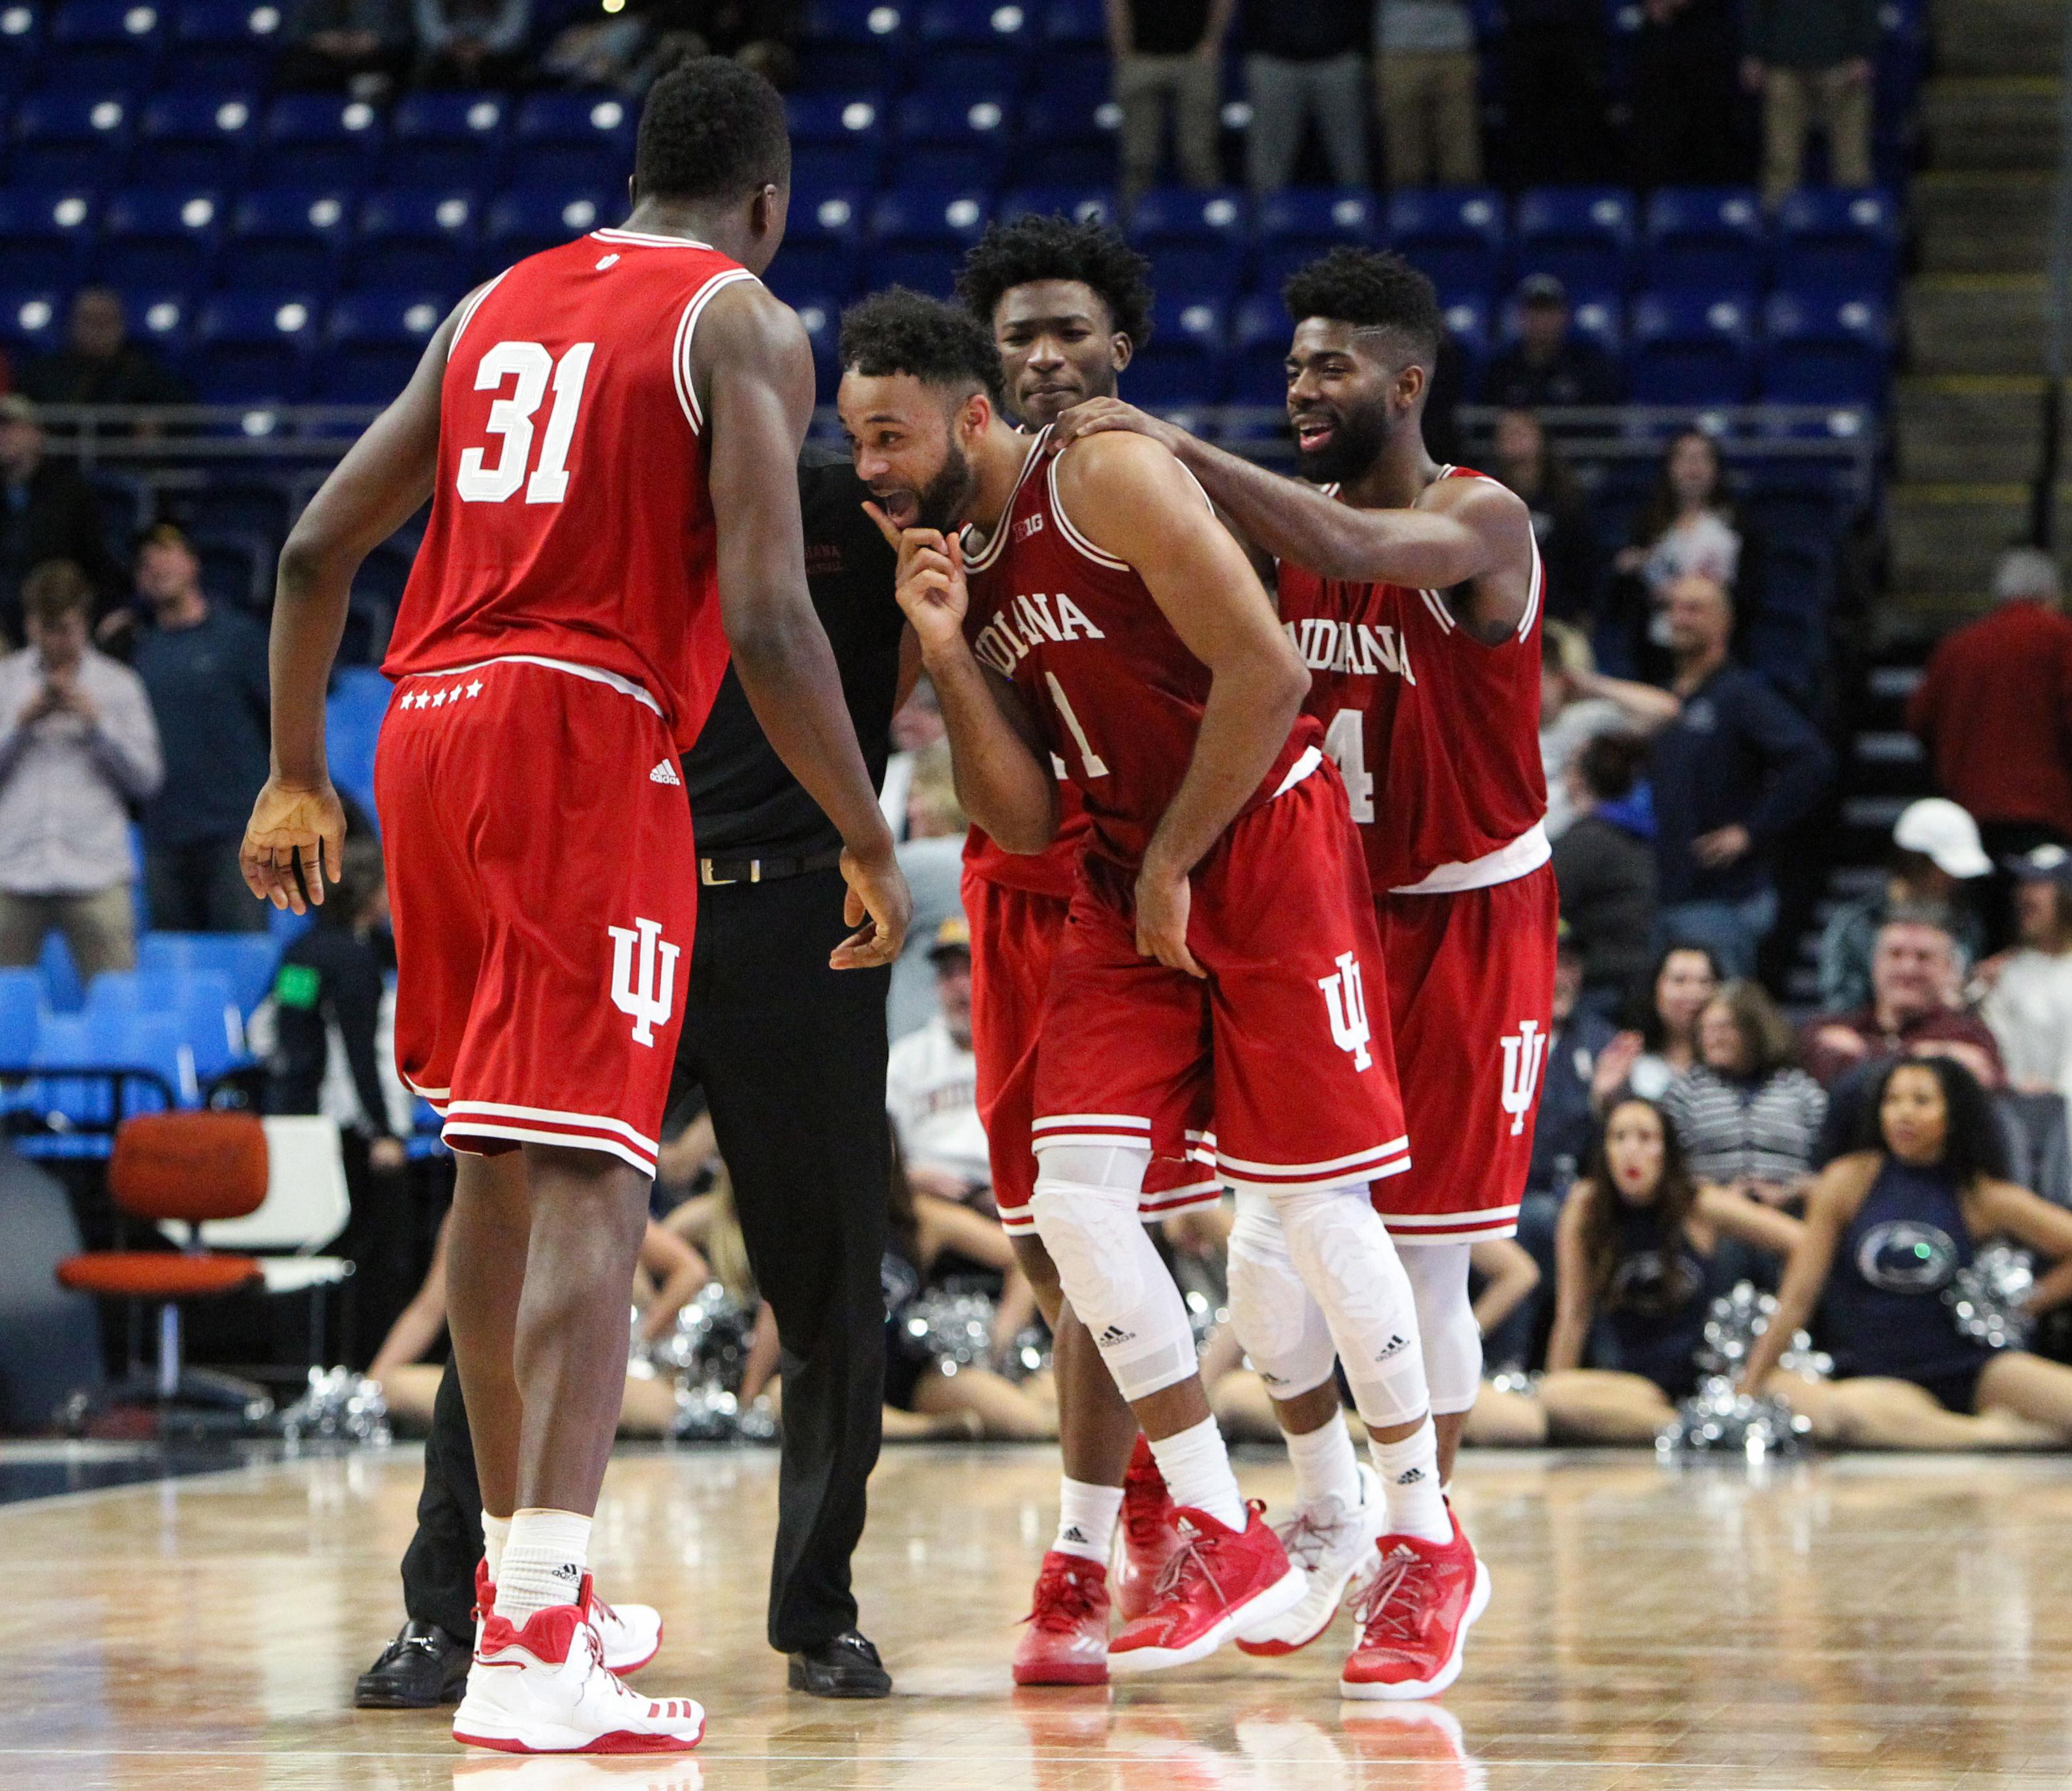 Indiana Basketball: James Blackmon Jr. named 2017 Jerry ...